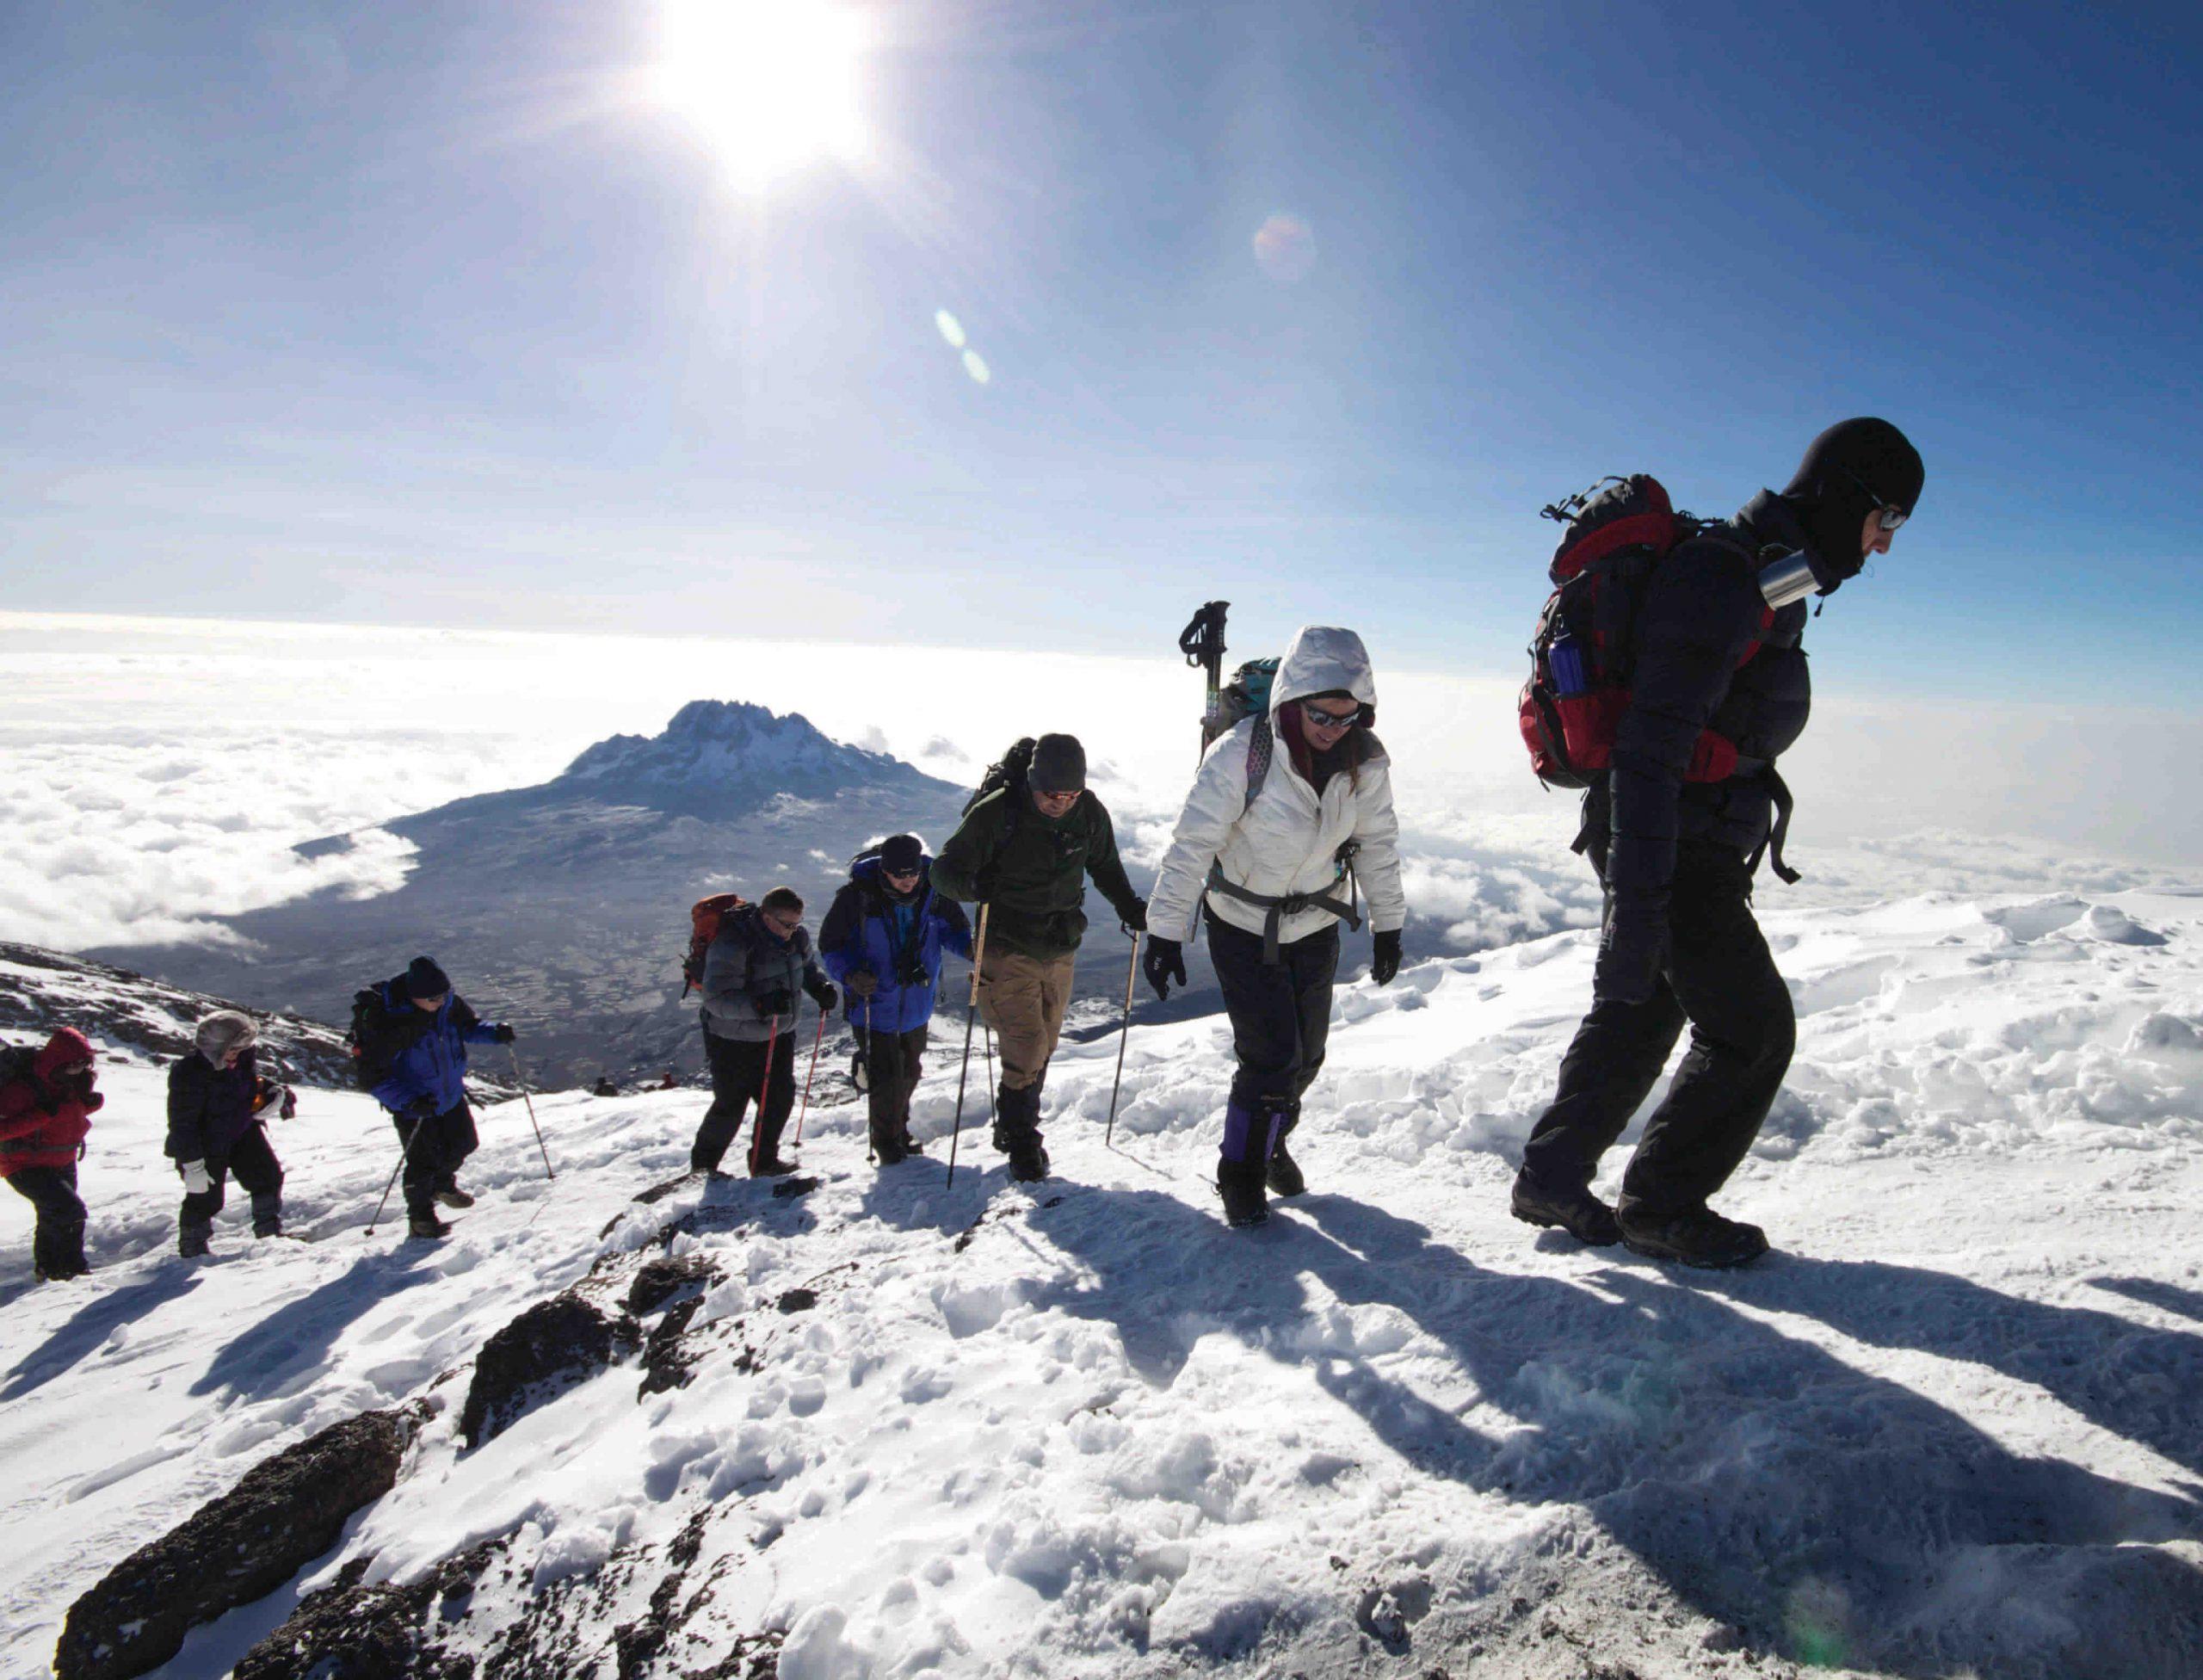 camps_international_climbing_mountain_using_correct_safety_procedures-2-1